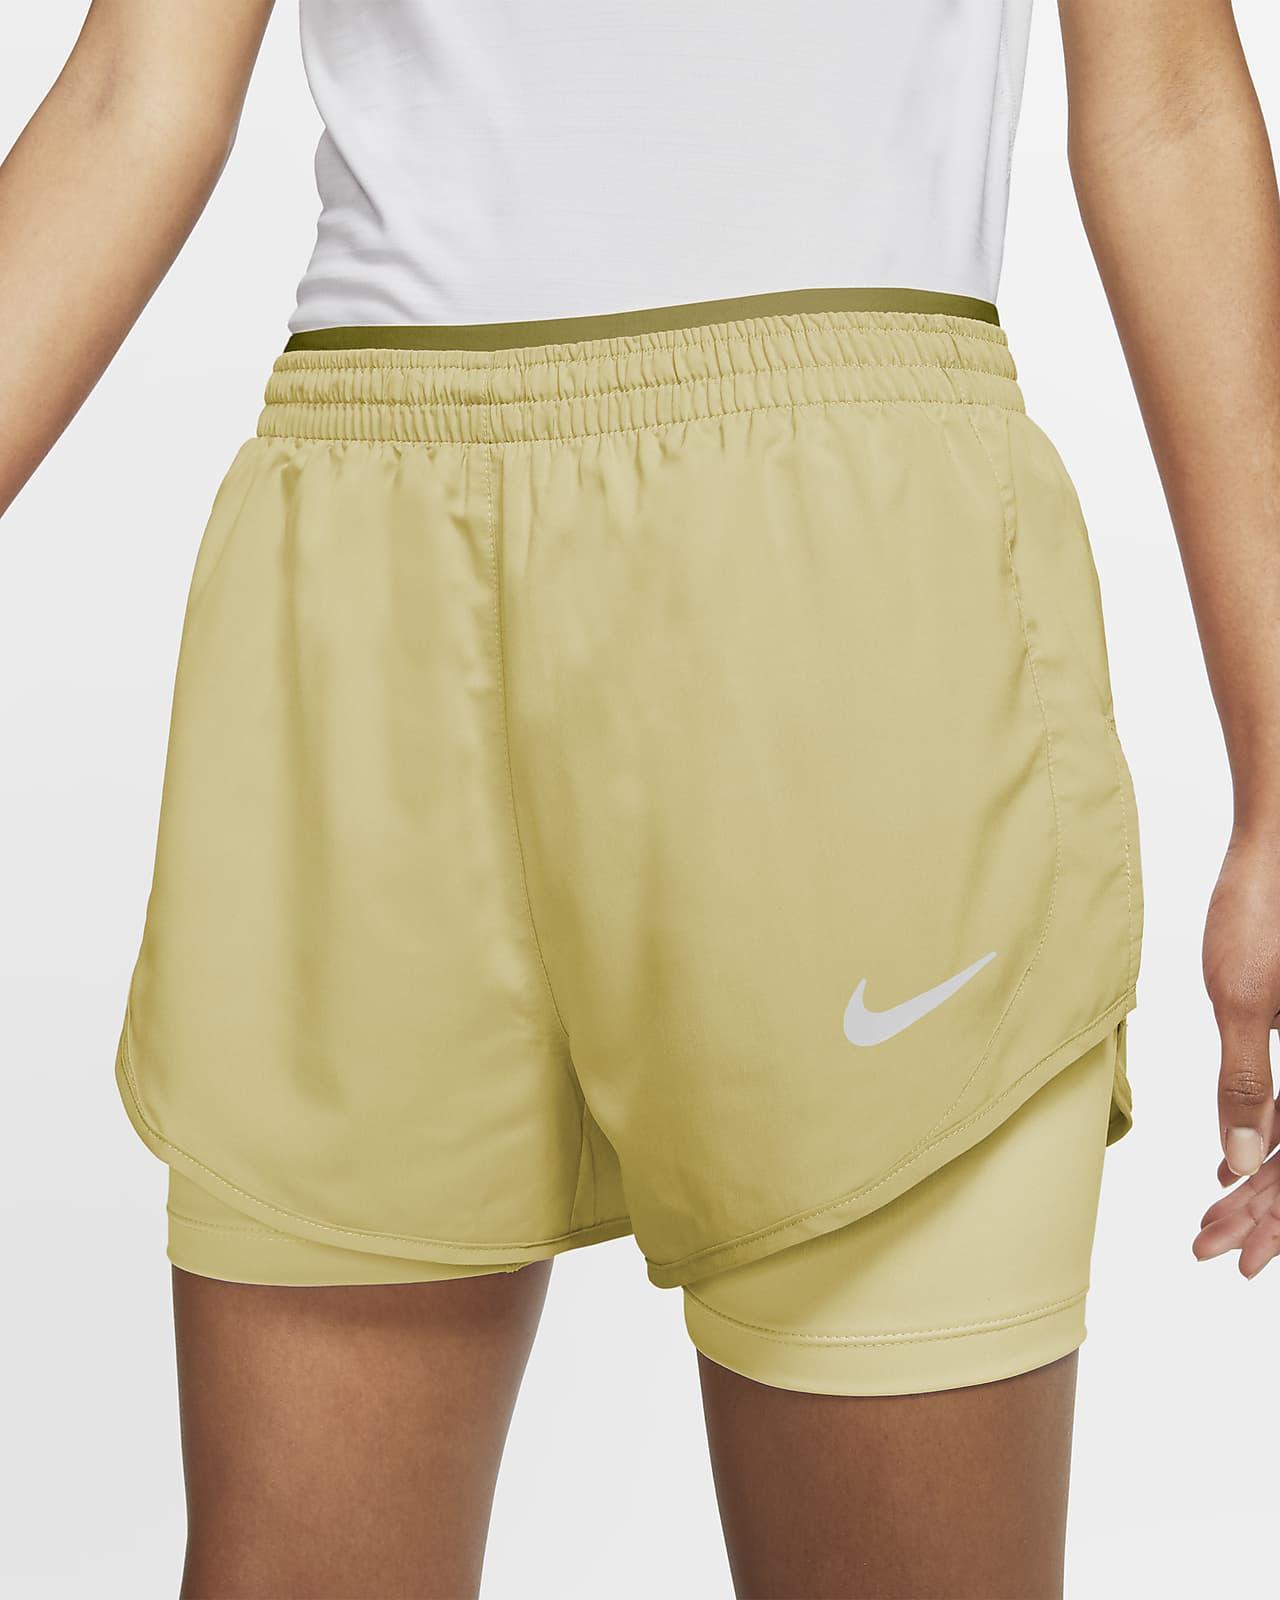 Nike Tempo Luxe Women's 2-in-1 Running